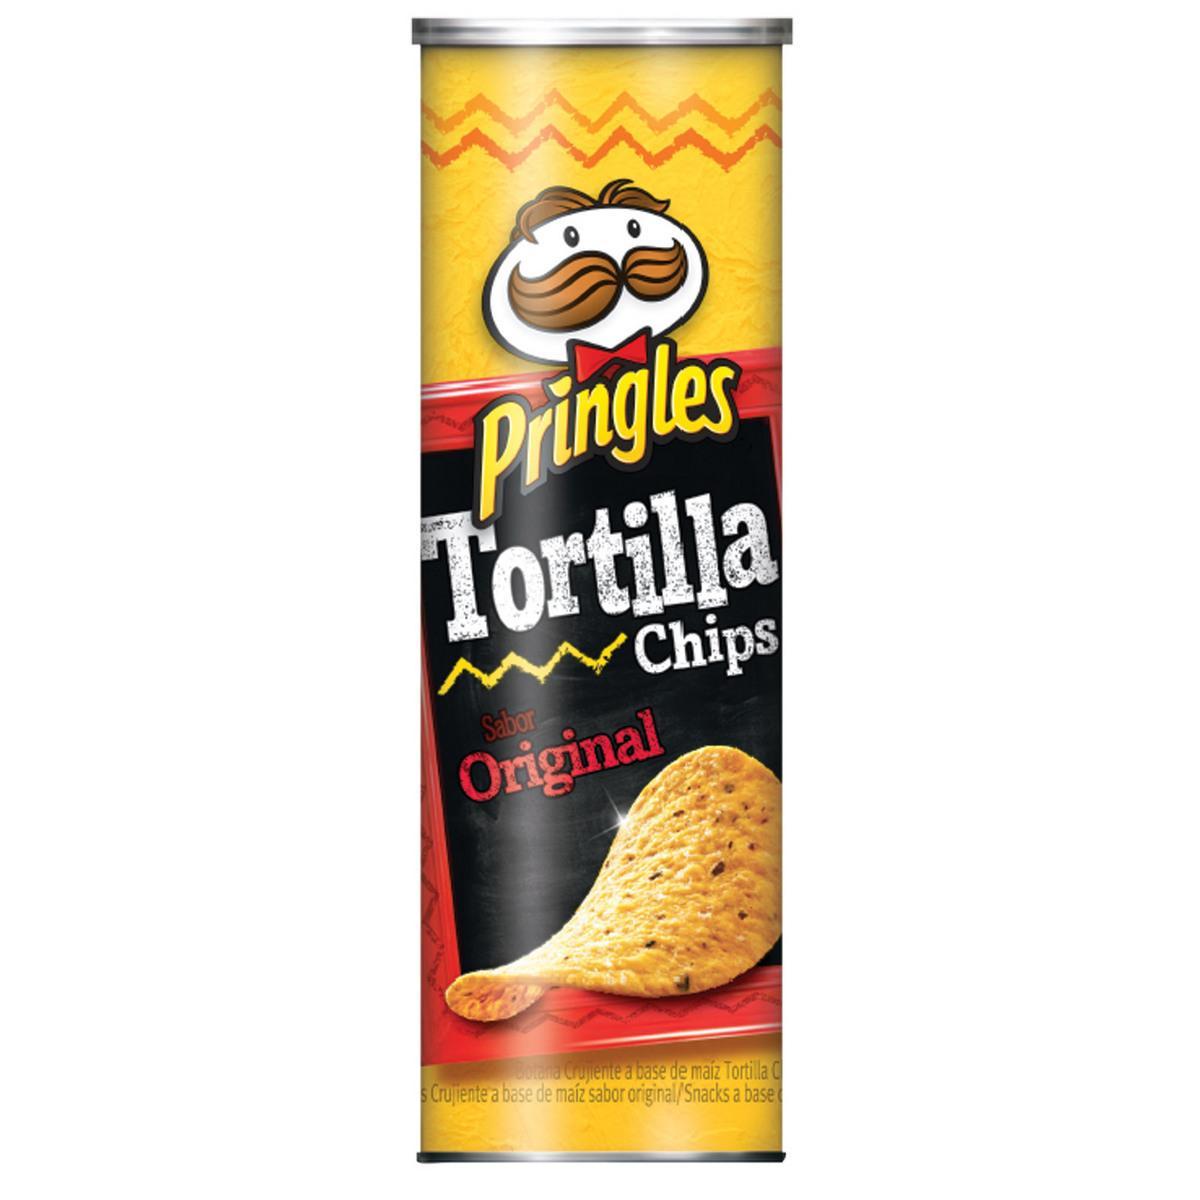 Pringles Tortilla Chips (via 40% sur la carte + Coupon Network)